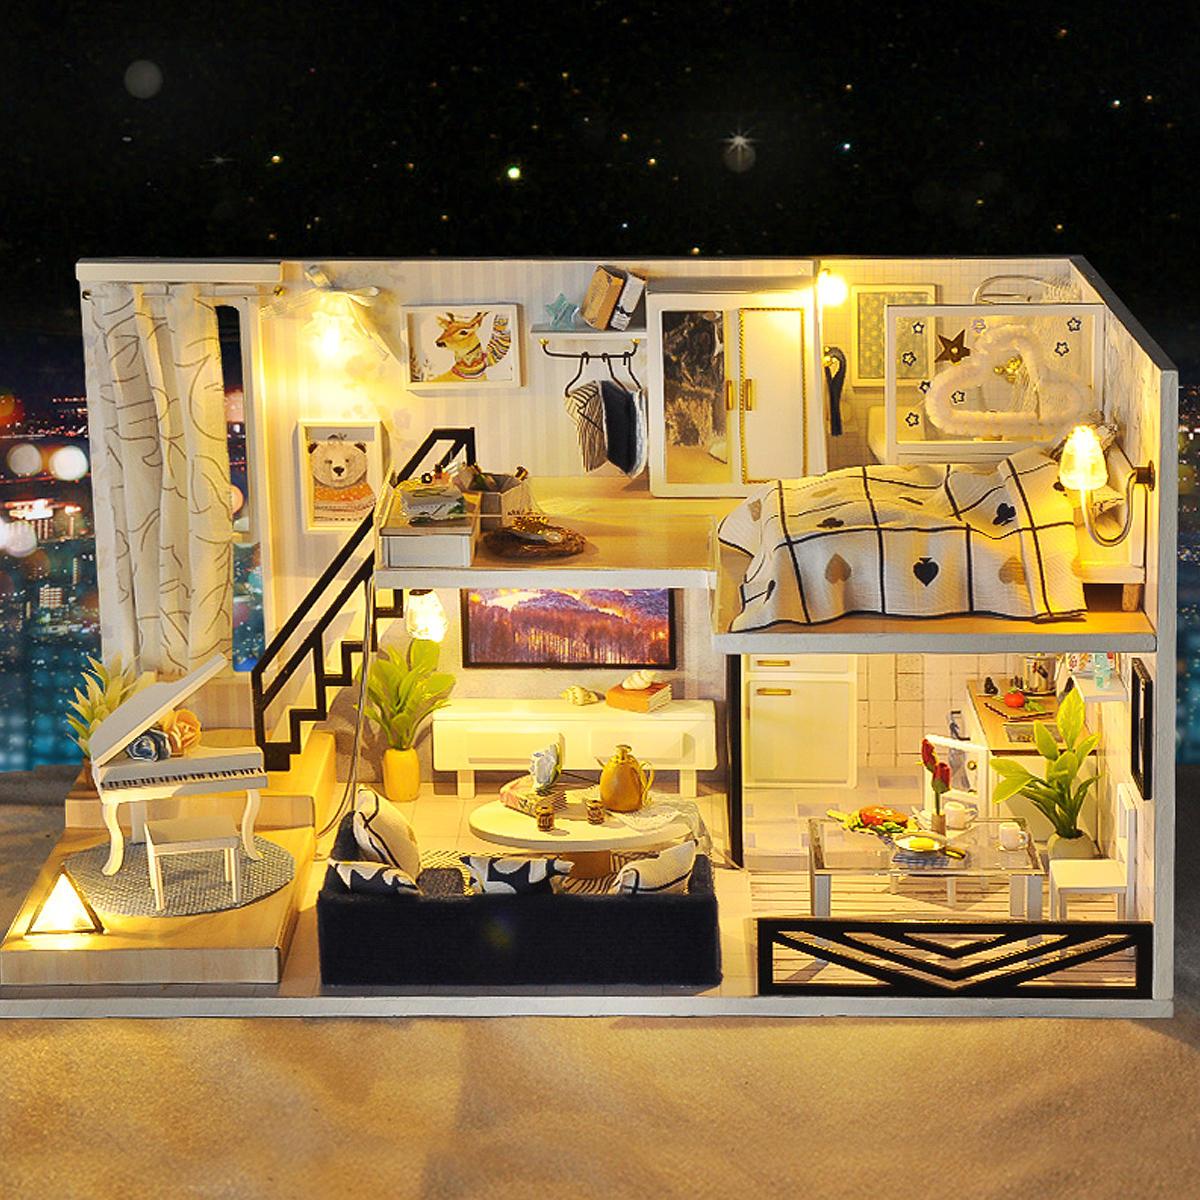 Time Shadow Modern Doll House miniatura DIY Kit Dollhouse con muebles luz LED Caja regalo